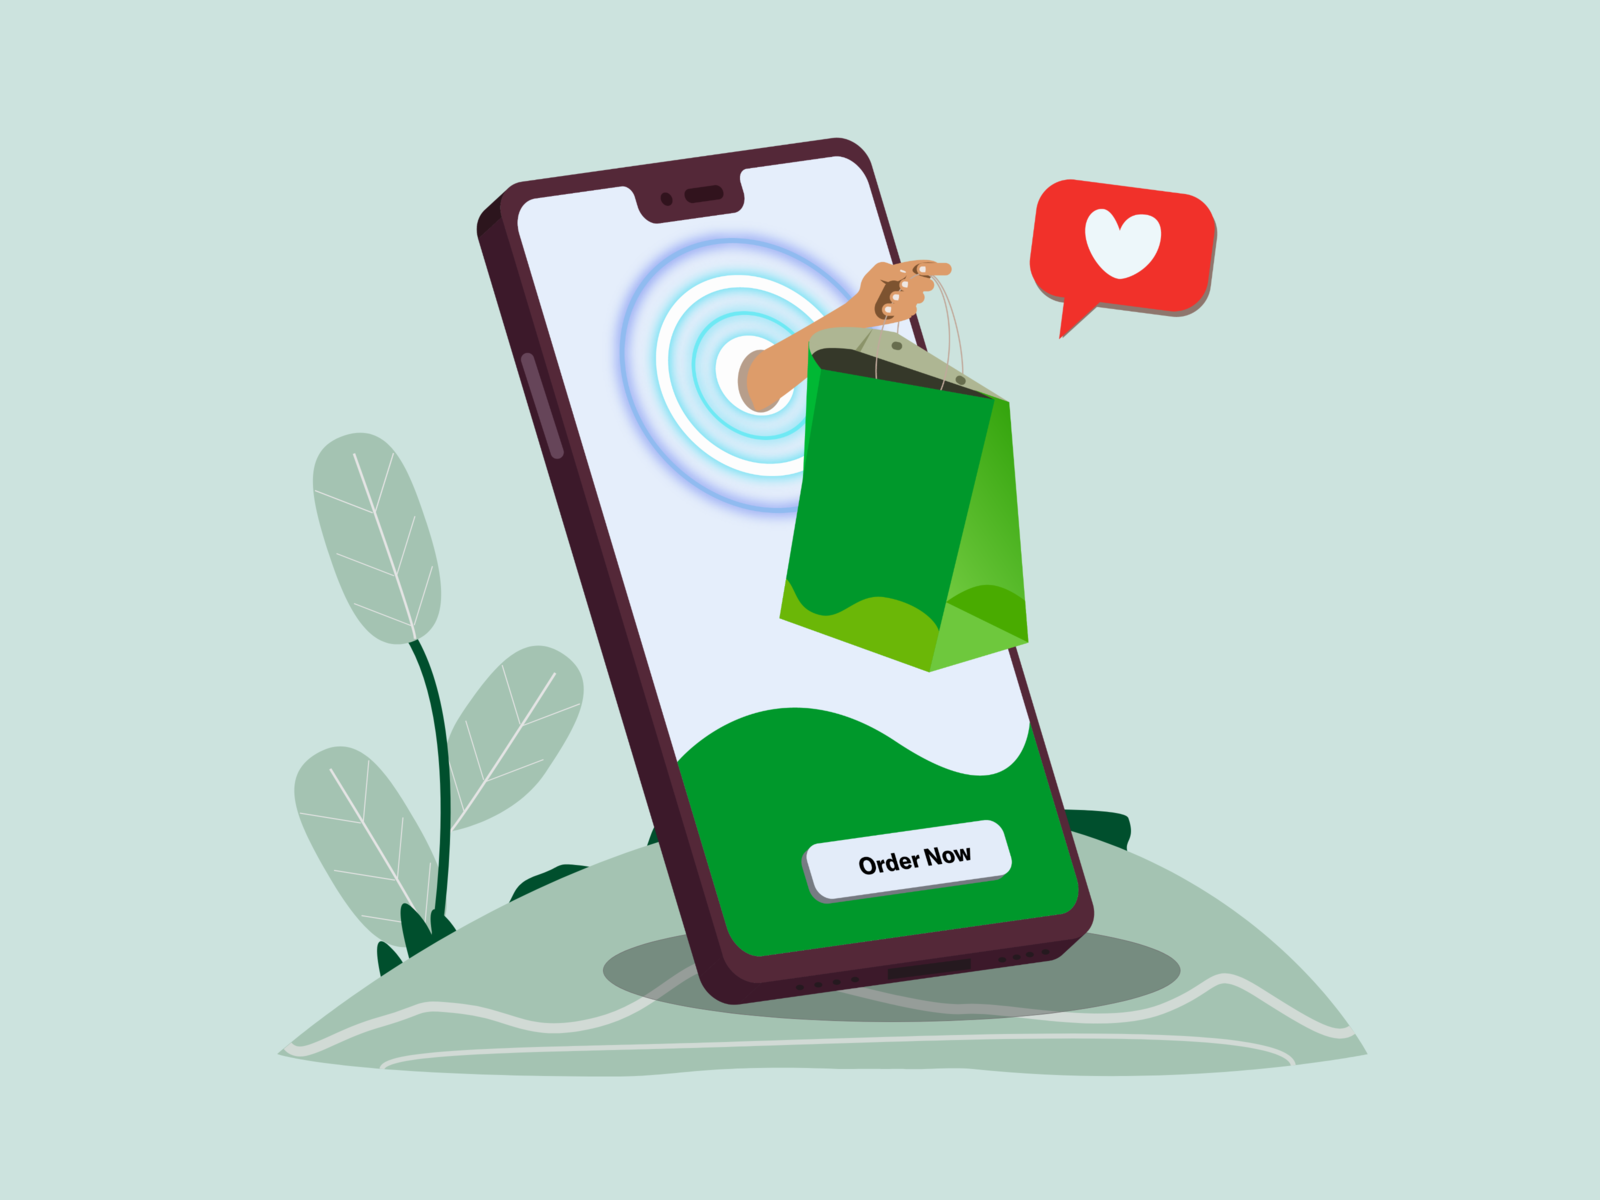 Order Your Food Through Mobile Shopping Online Logo Online Posters Mobile Shop Design